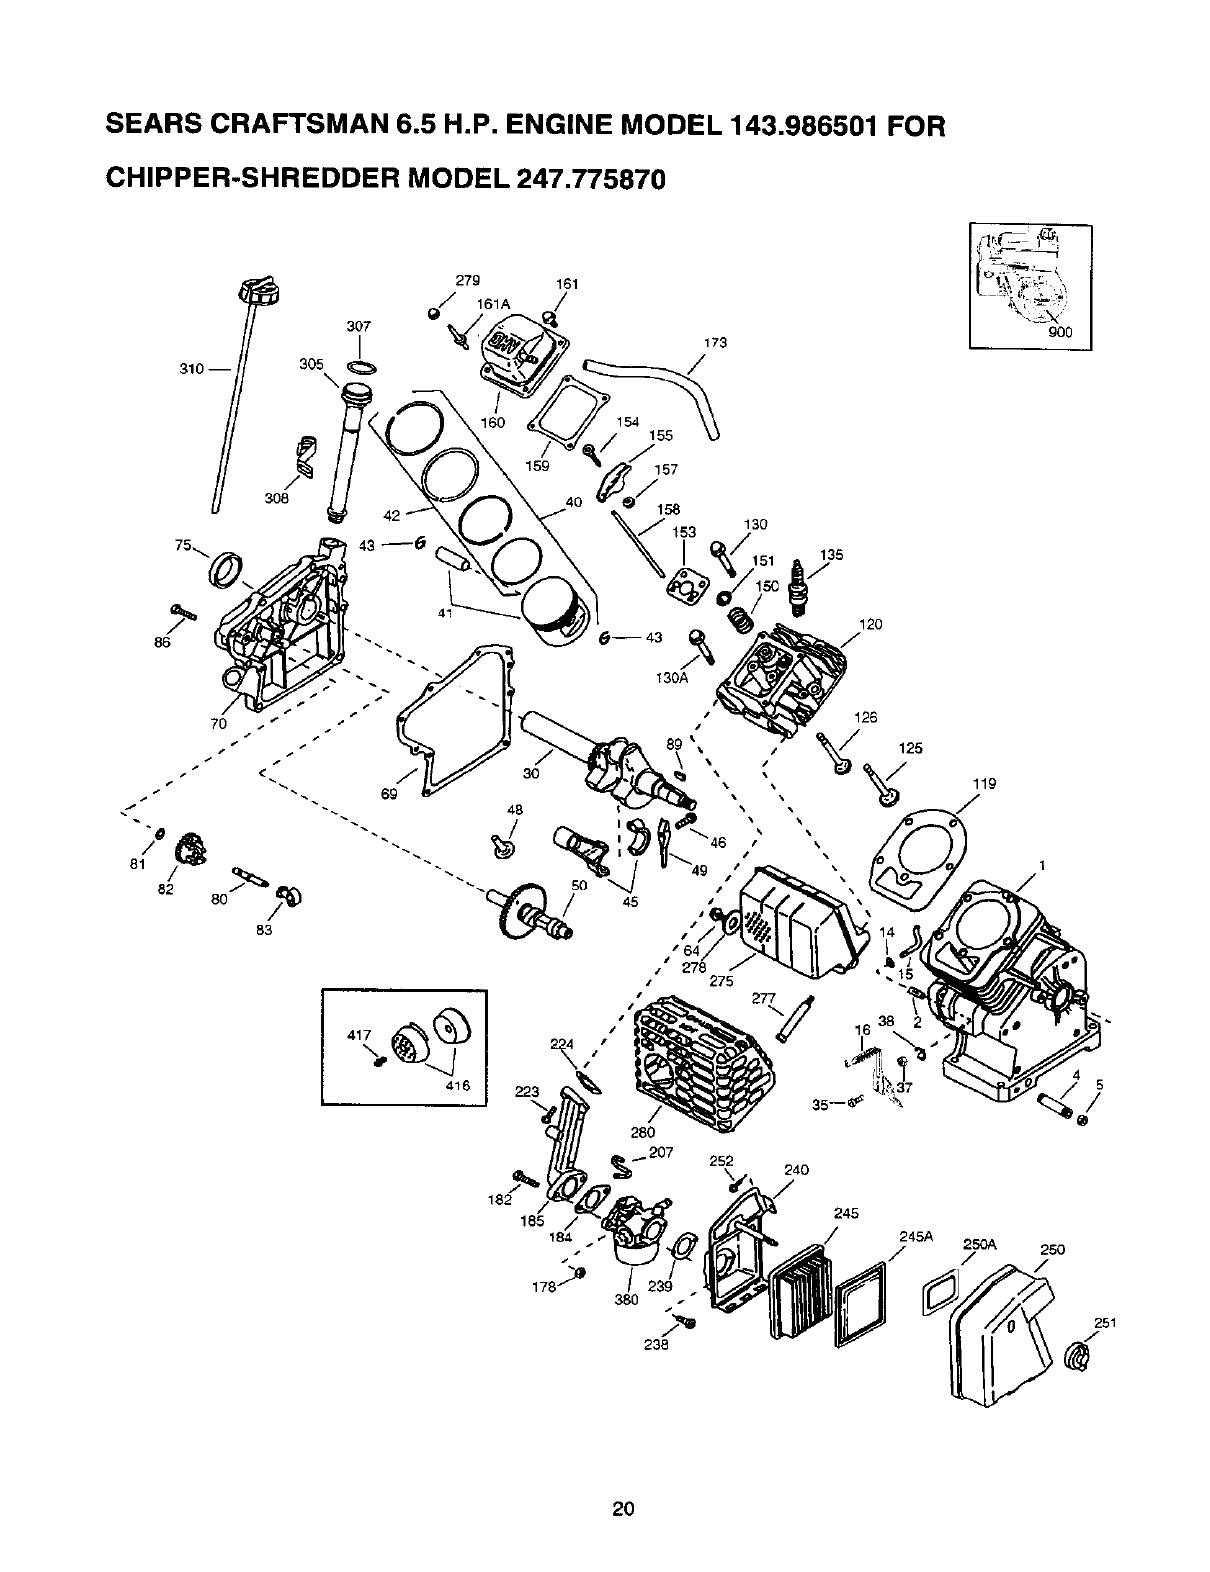 Craftsman 247.775870, 77587 I